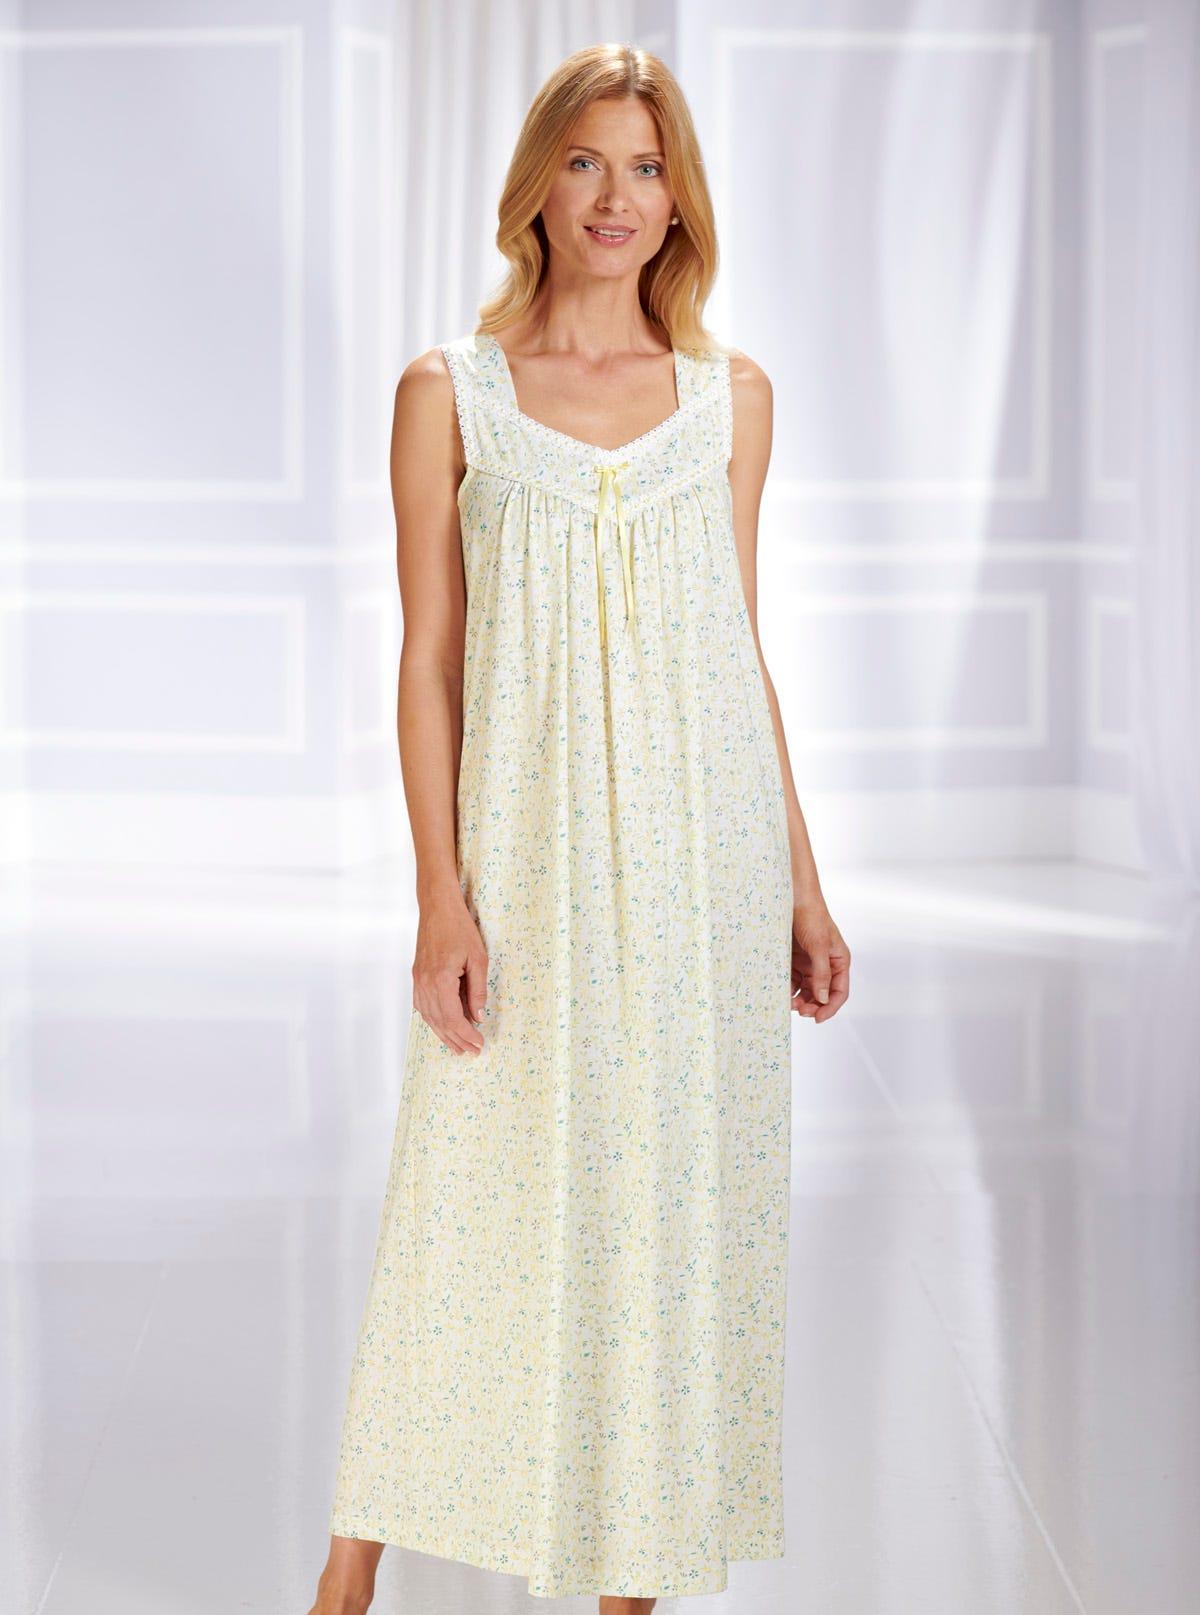 357bba80cb Fine Cotton Nightdress - Nightdresses and Nightshirts - Nightwear ...